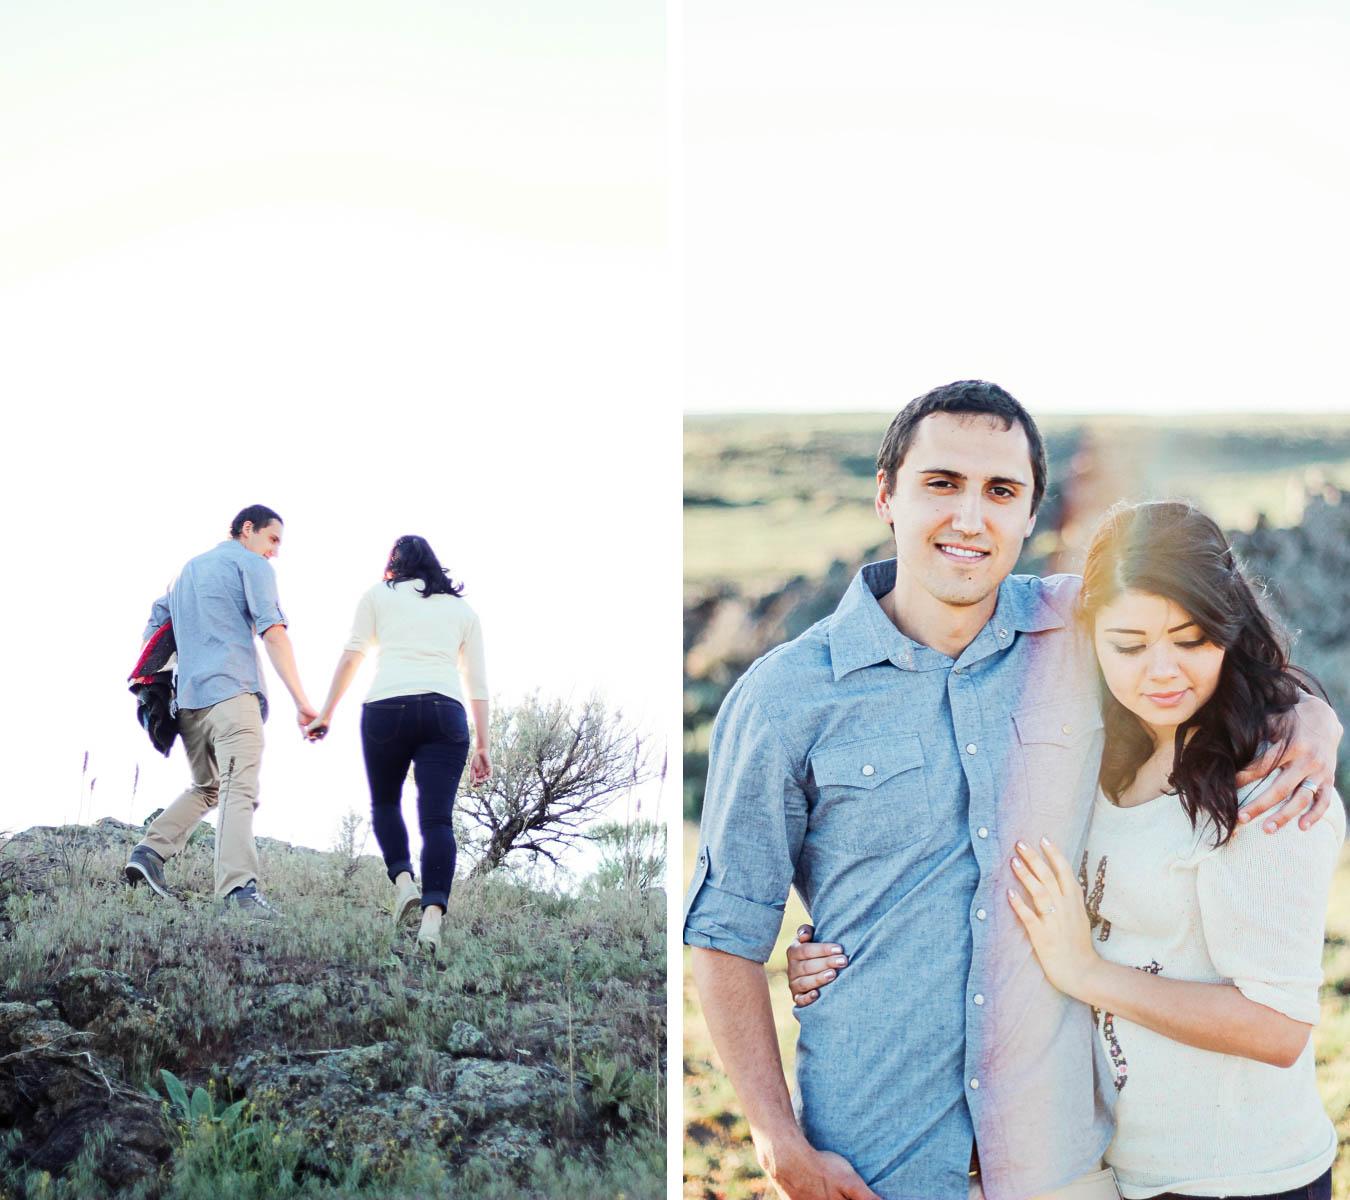 charlie-broc-couples-session-rexburg-idaho-chicago-engagement-photographer-claytonphotodesign-03.jpg